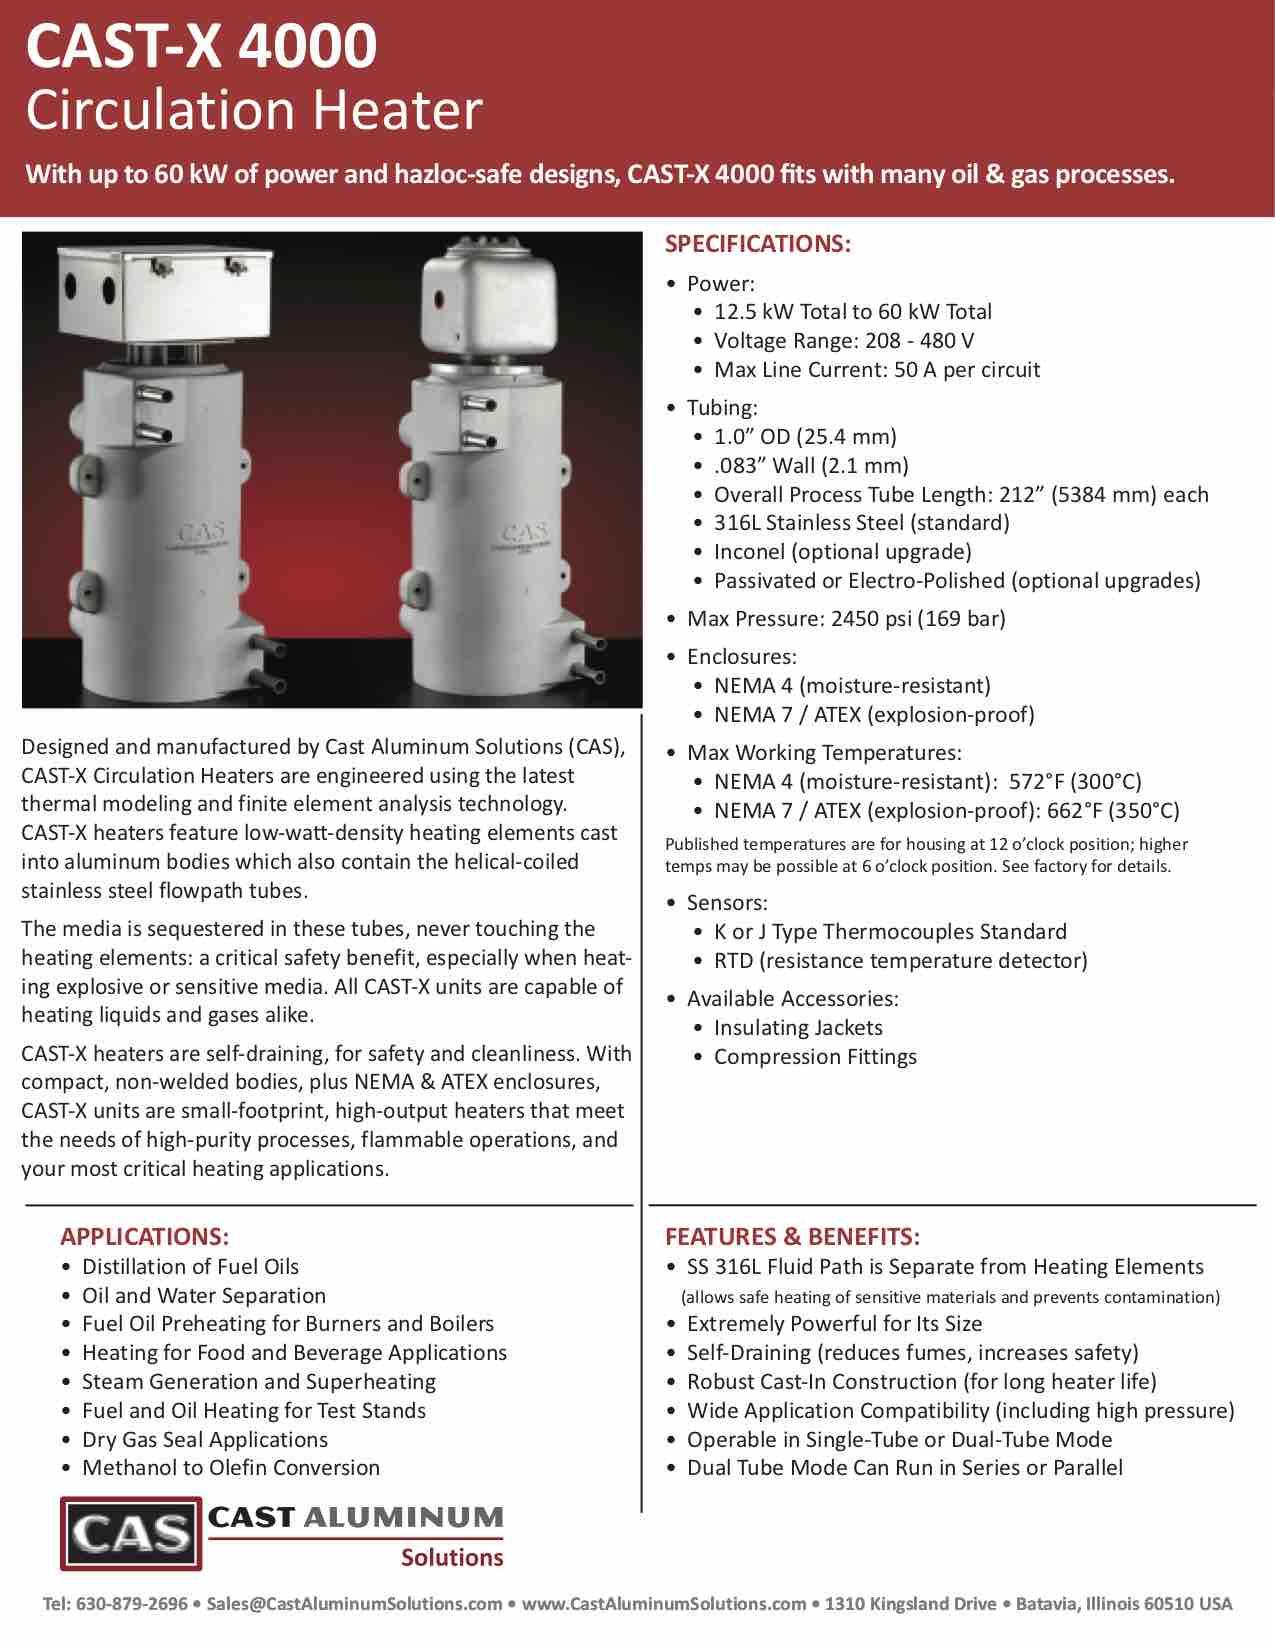 CAST X 4000 Circulation Heater Cast Aluminum Solutions (dragged)